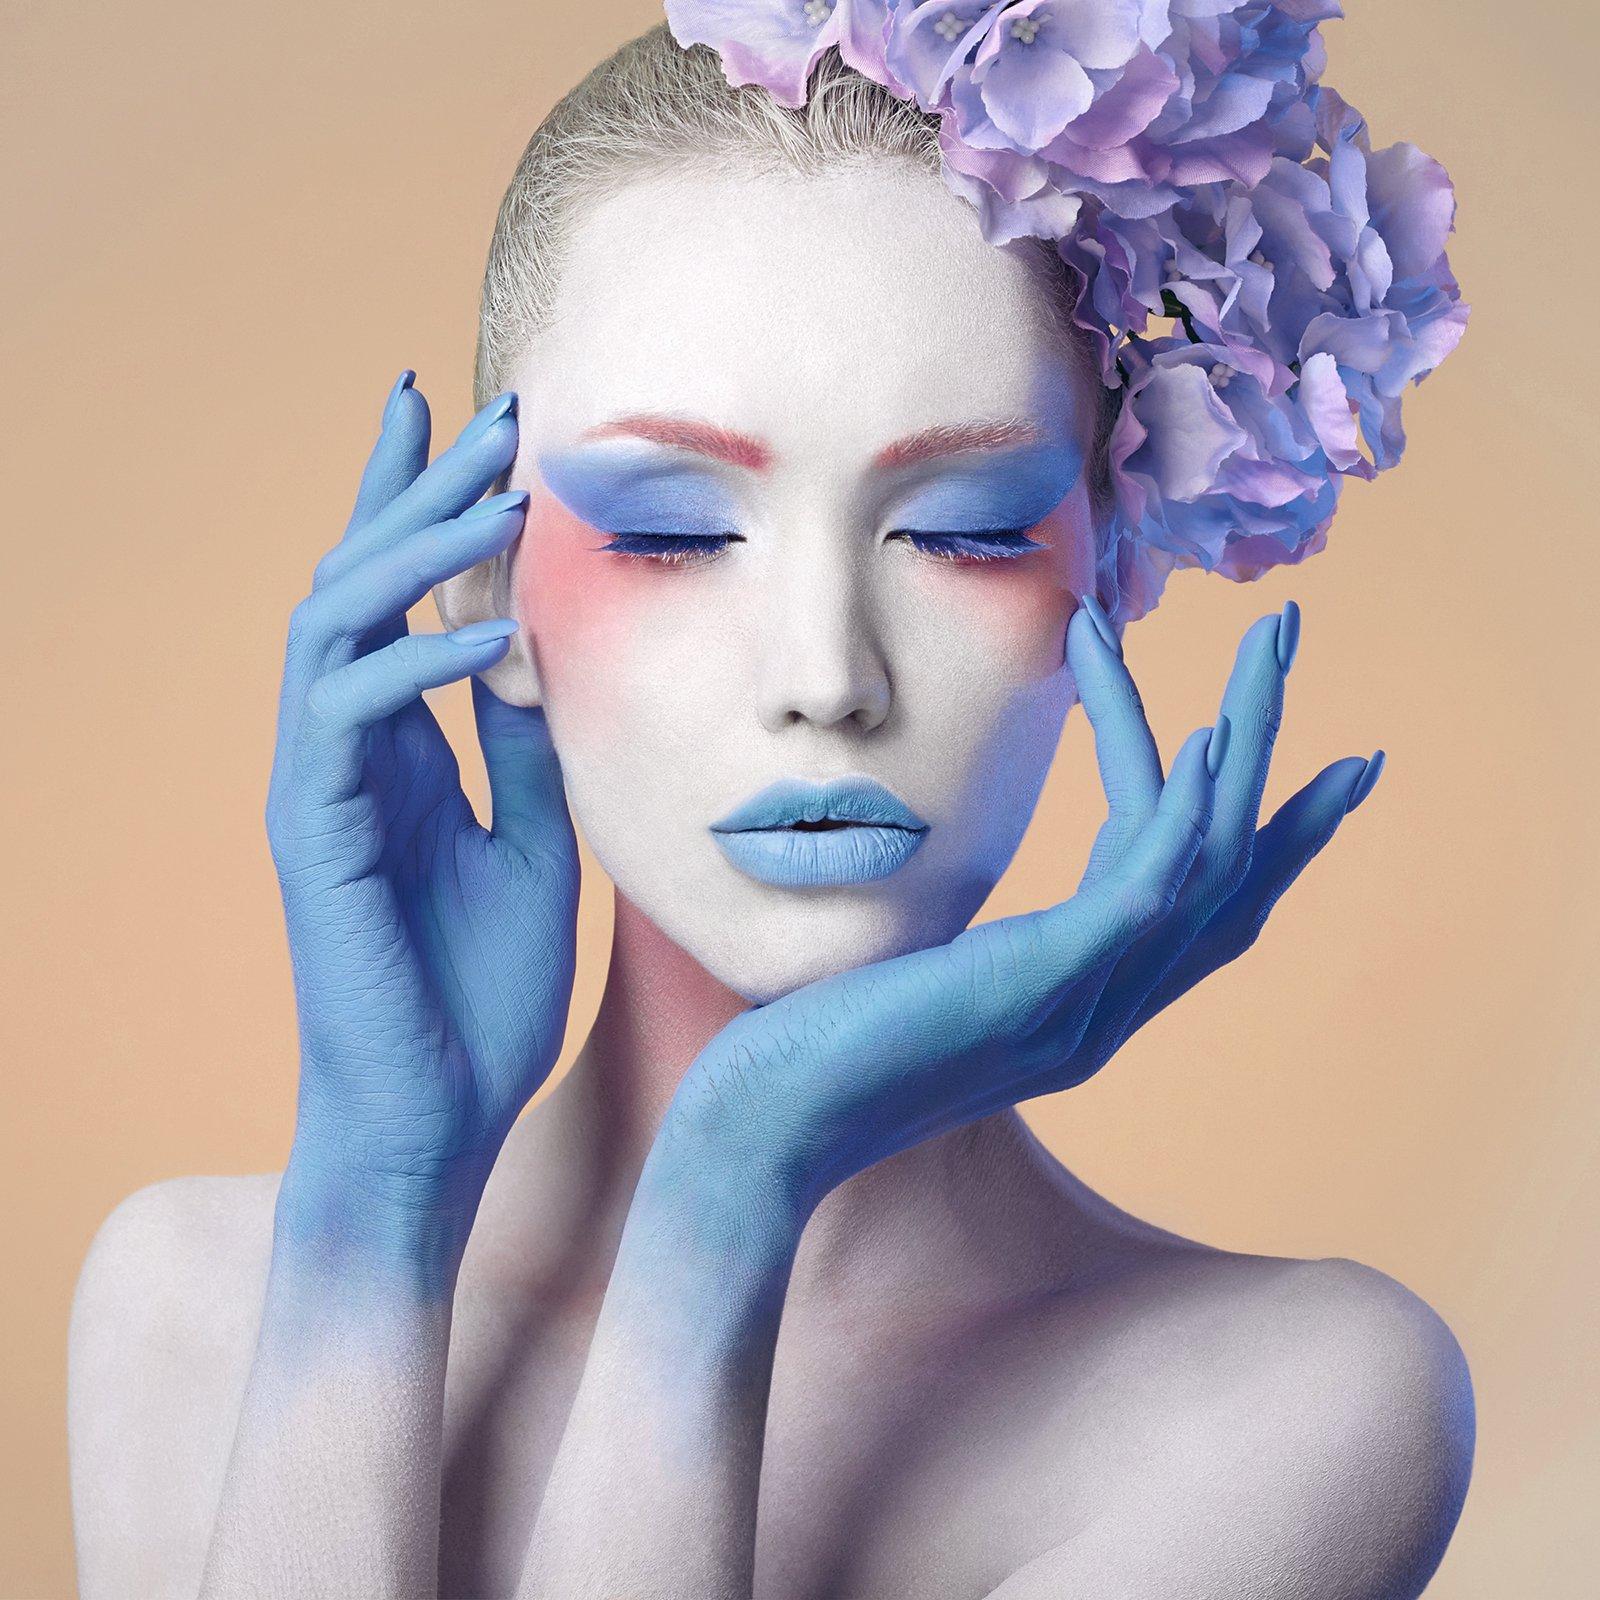 Prijs Permanente Make-Up Amersfoort